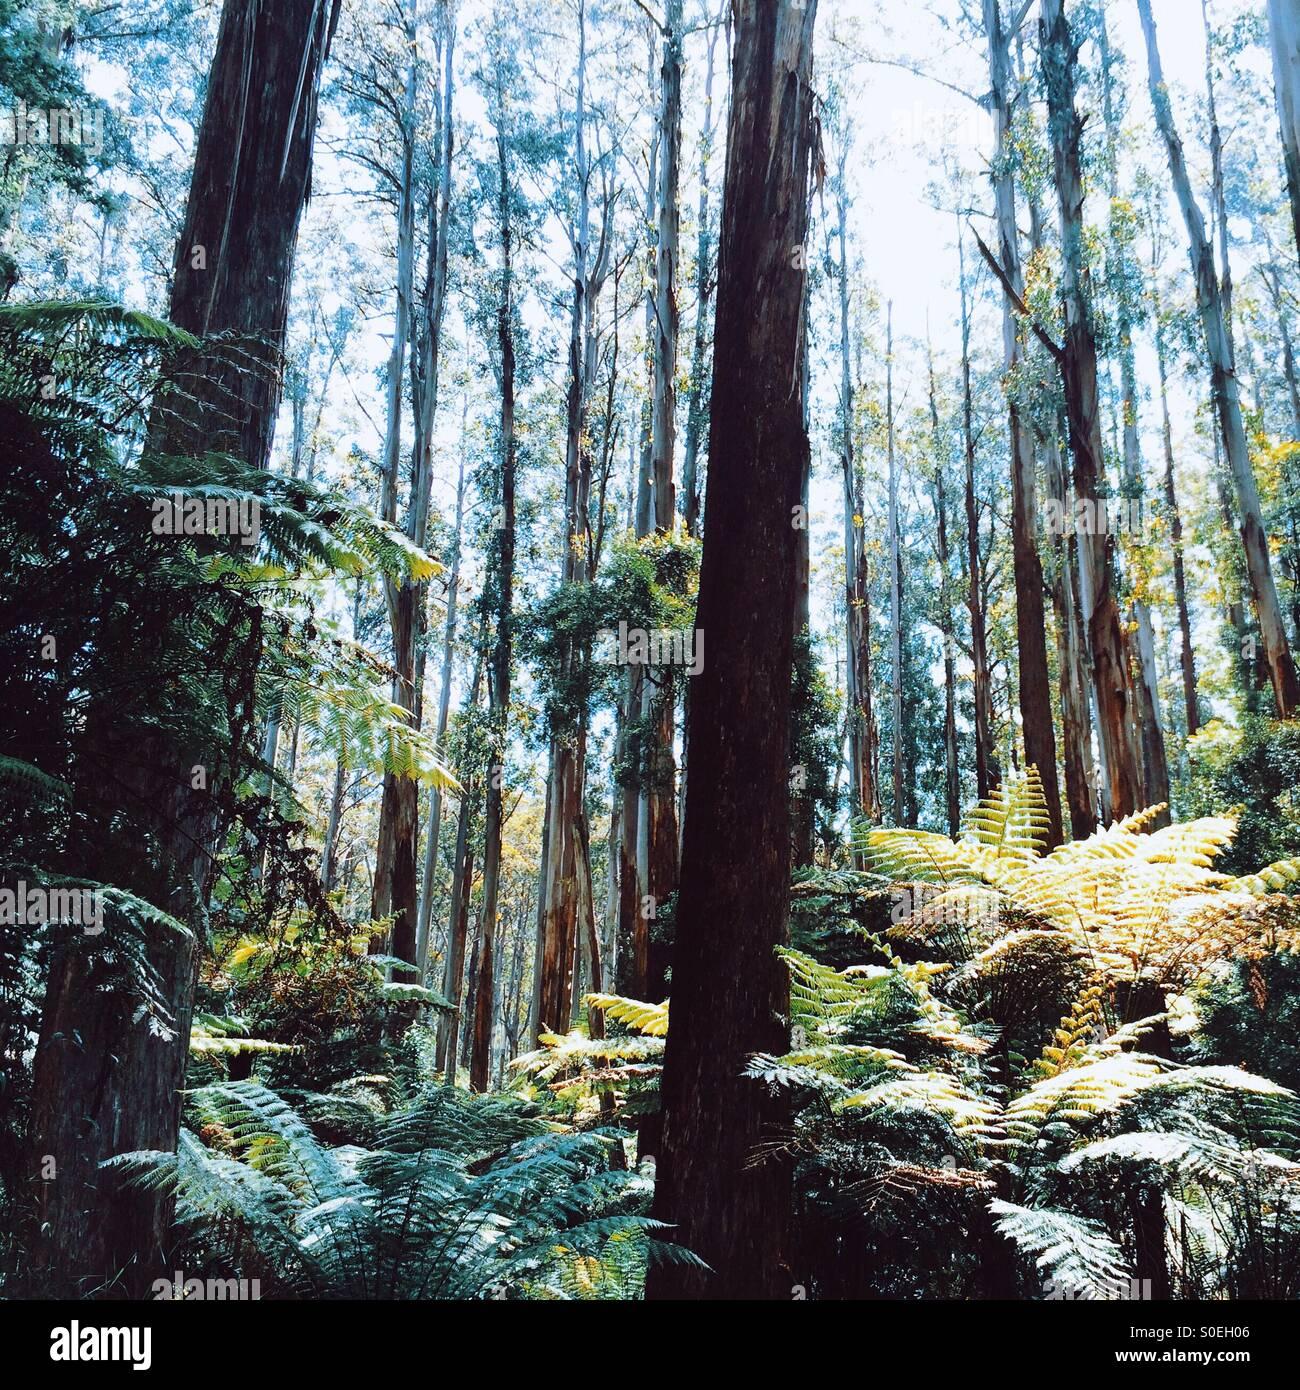 Mountain Ash forest, Dandenong Ranges, Victoria, Australia - Stock Image